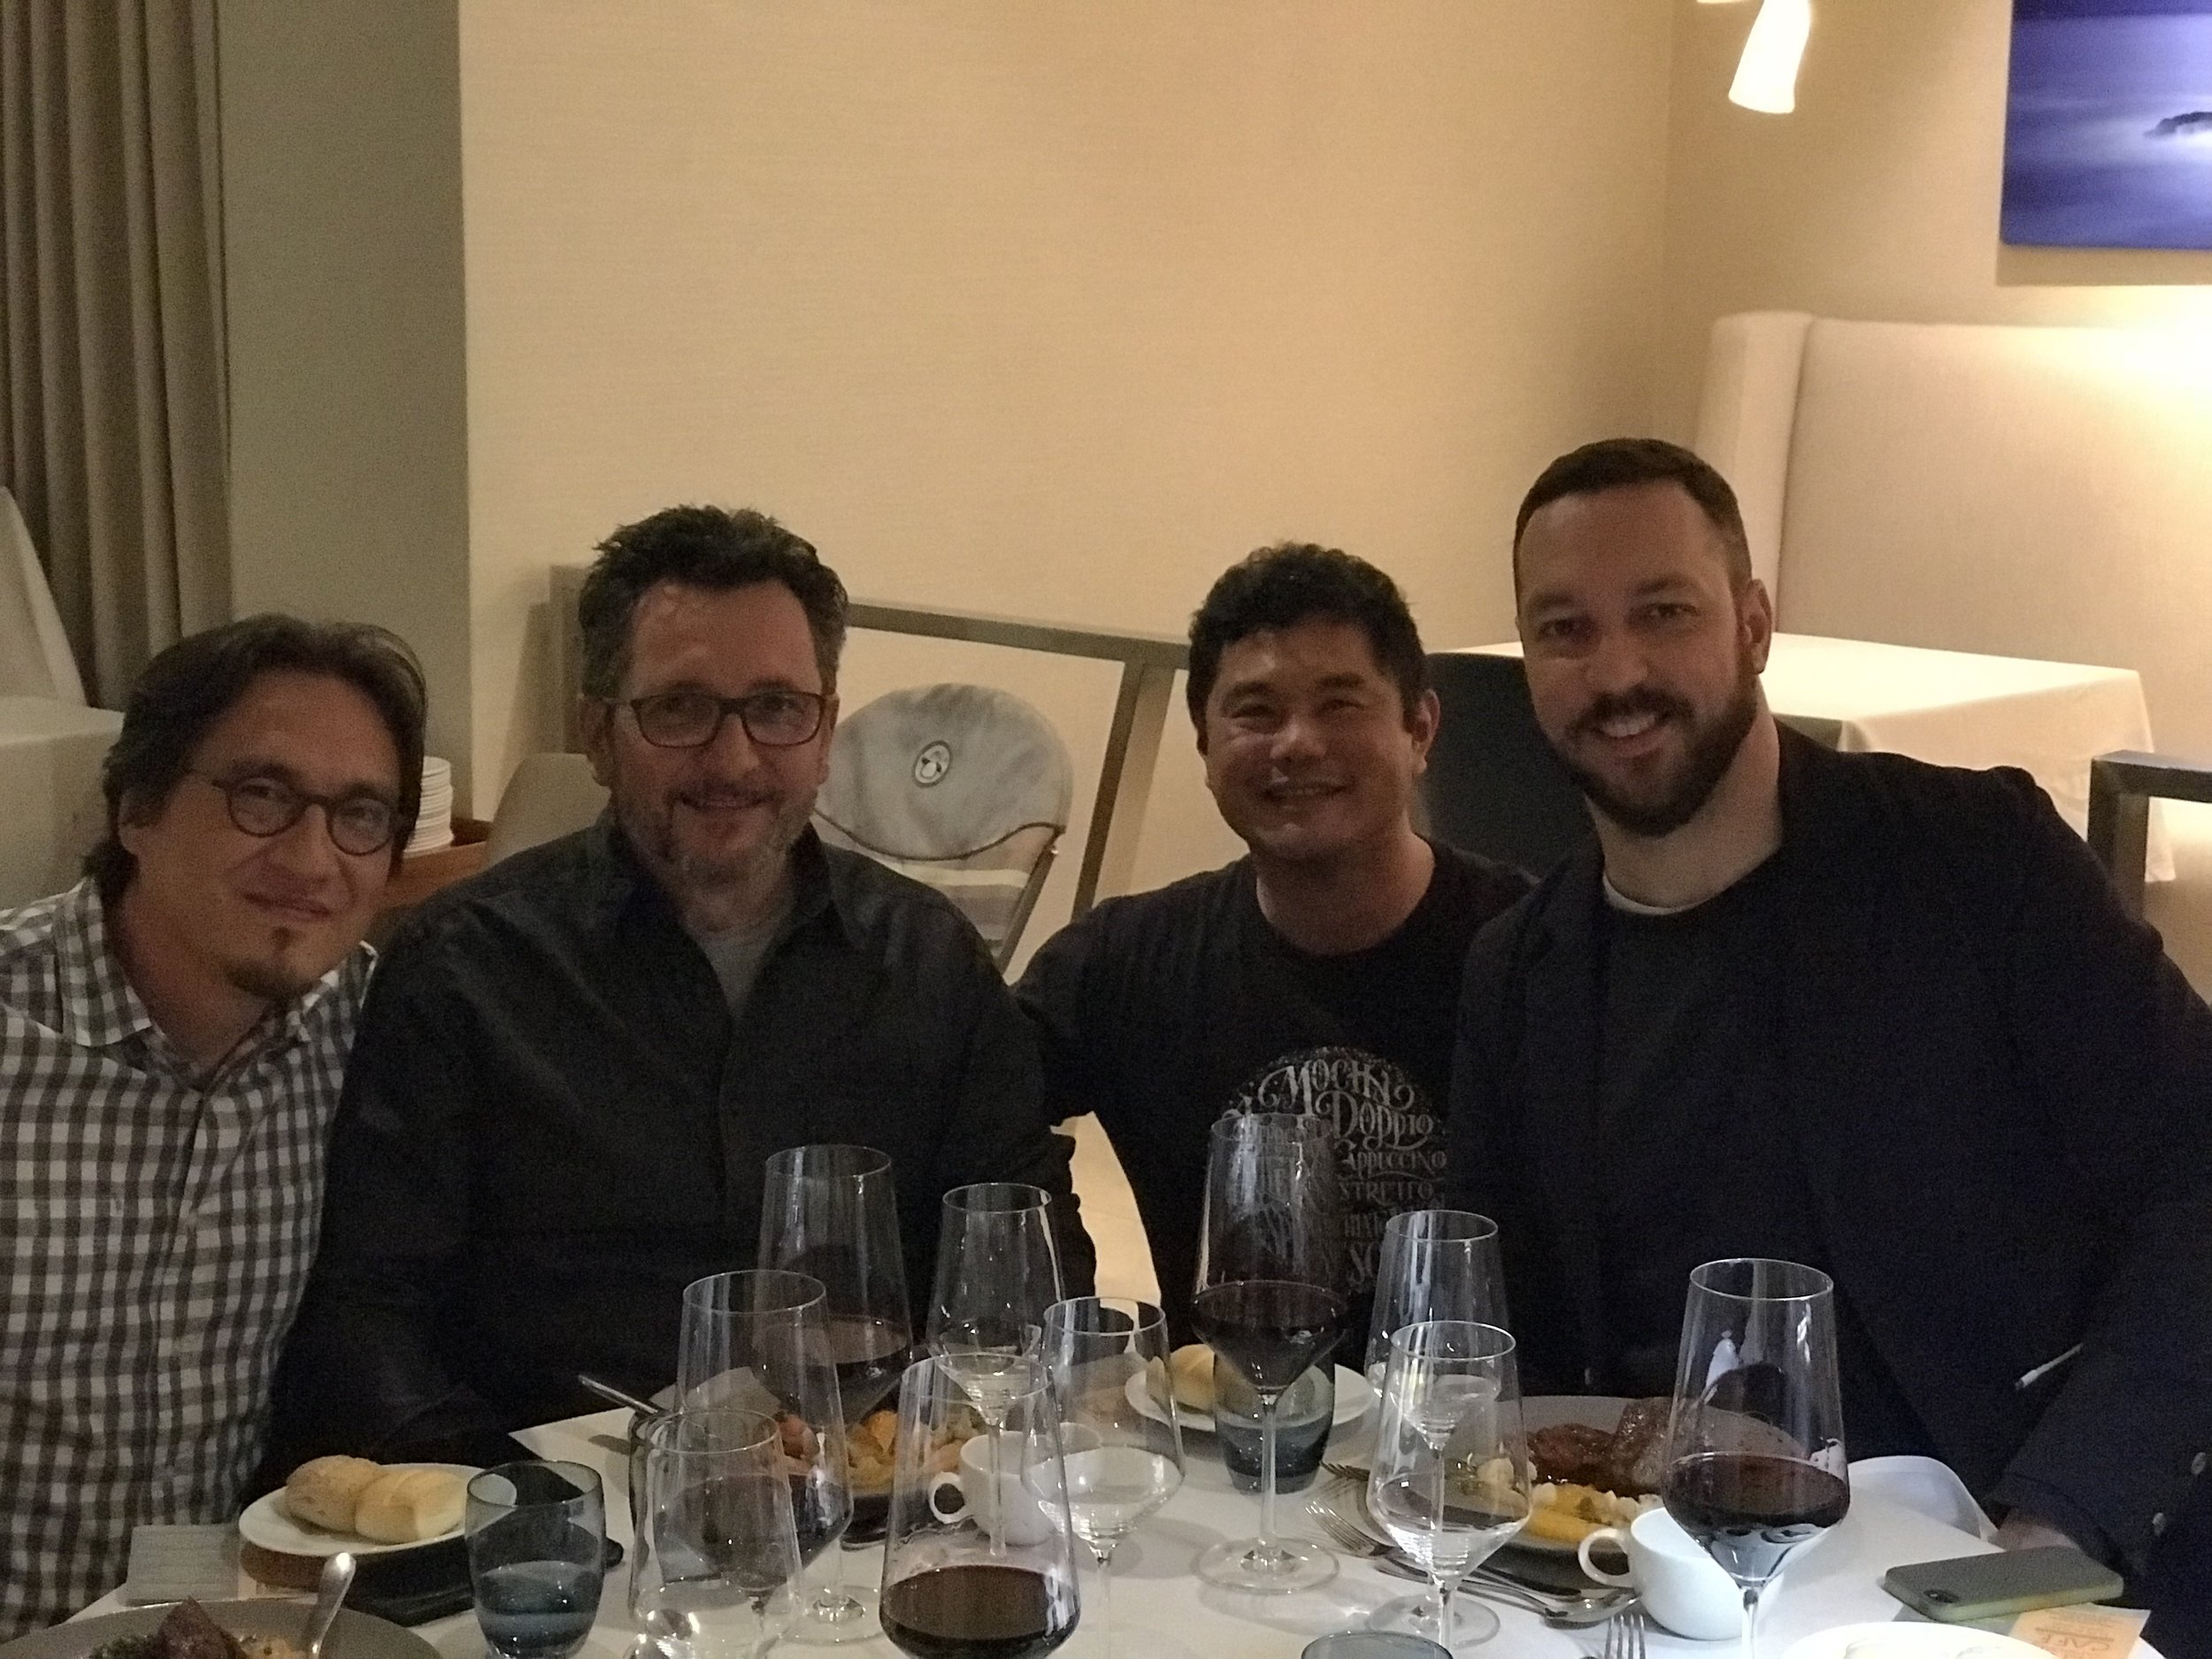 Daniel Kondo, Reinaldo Coser e Rafael Tonon